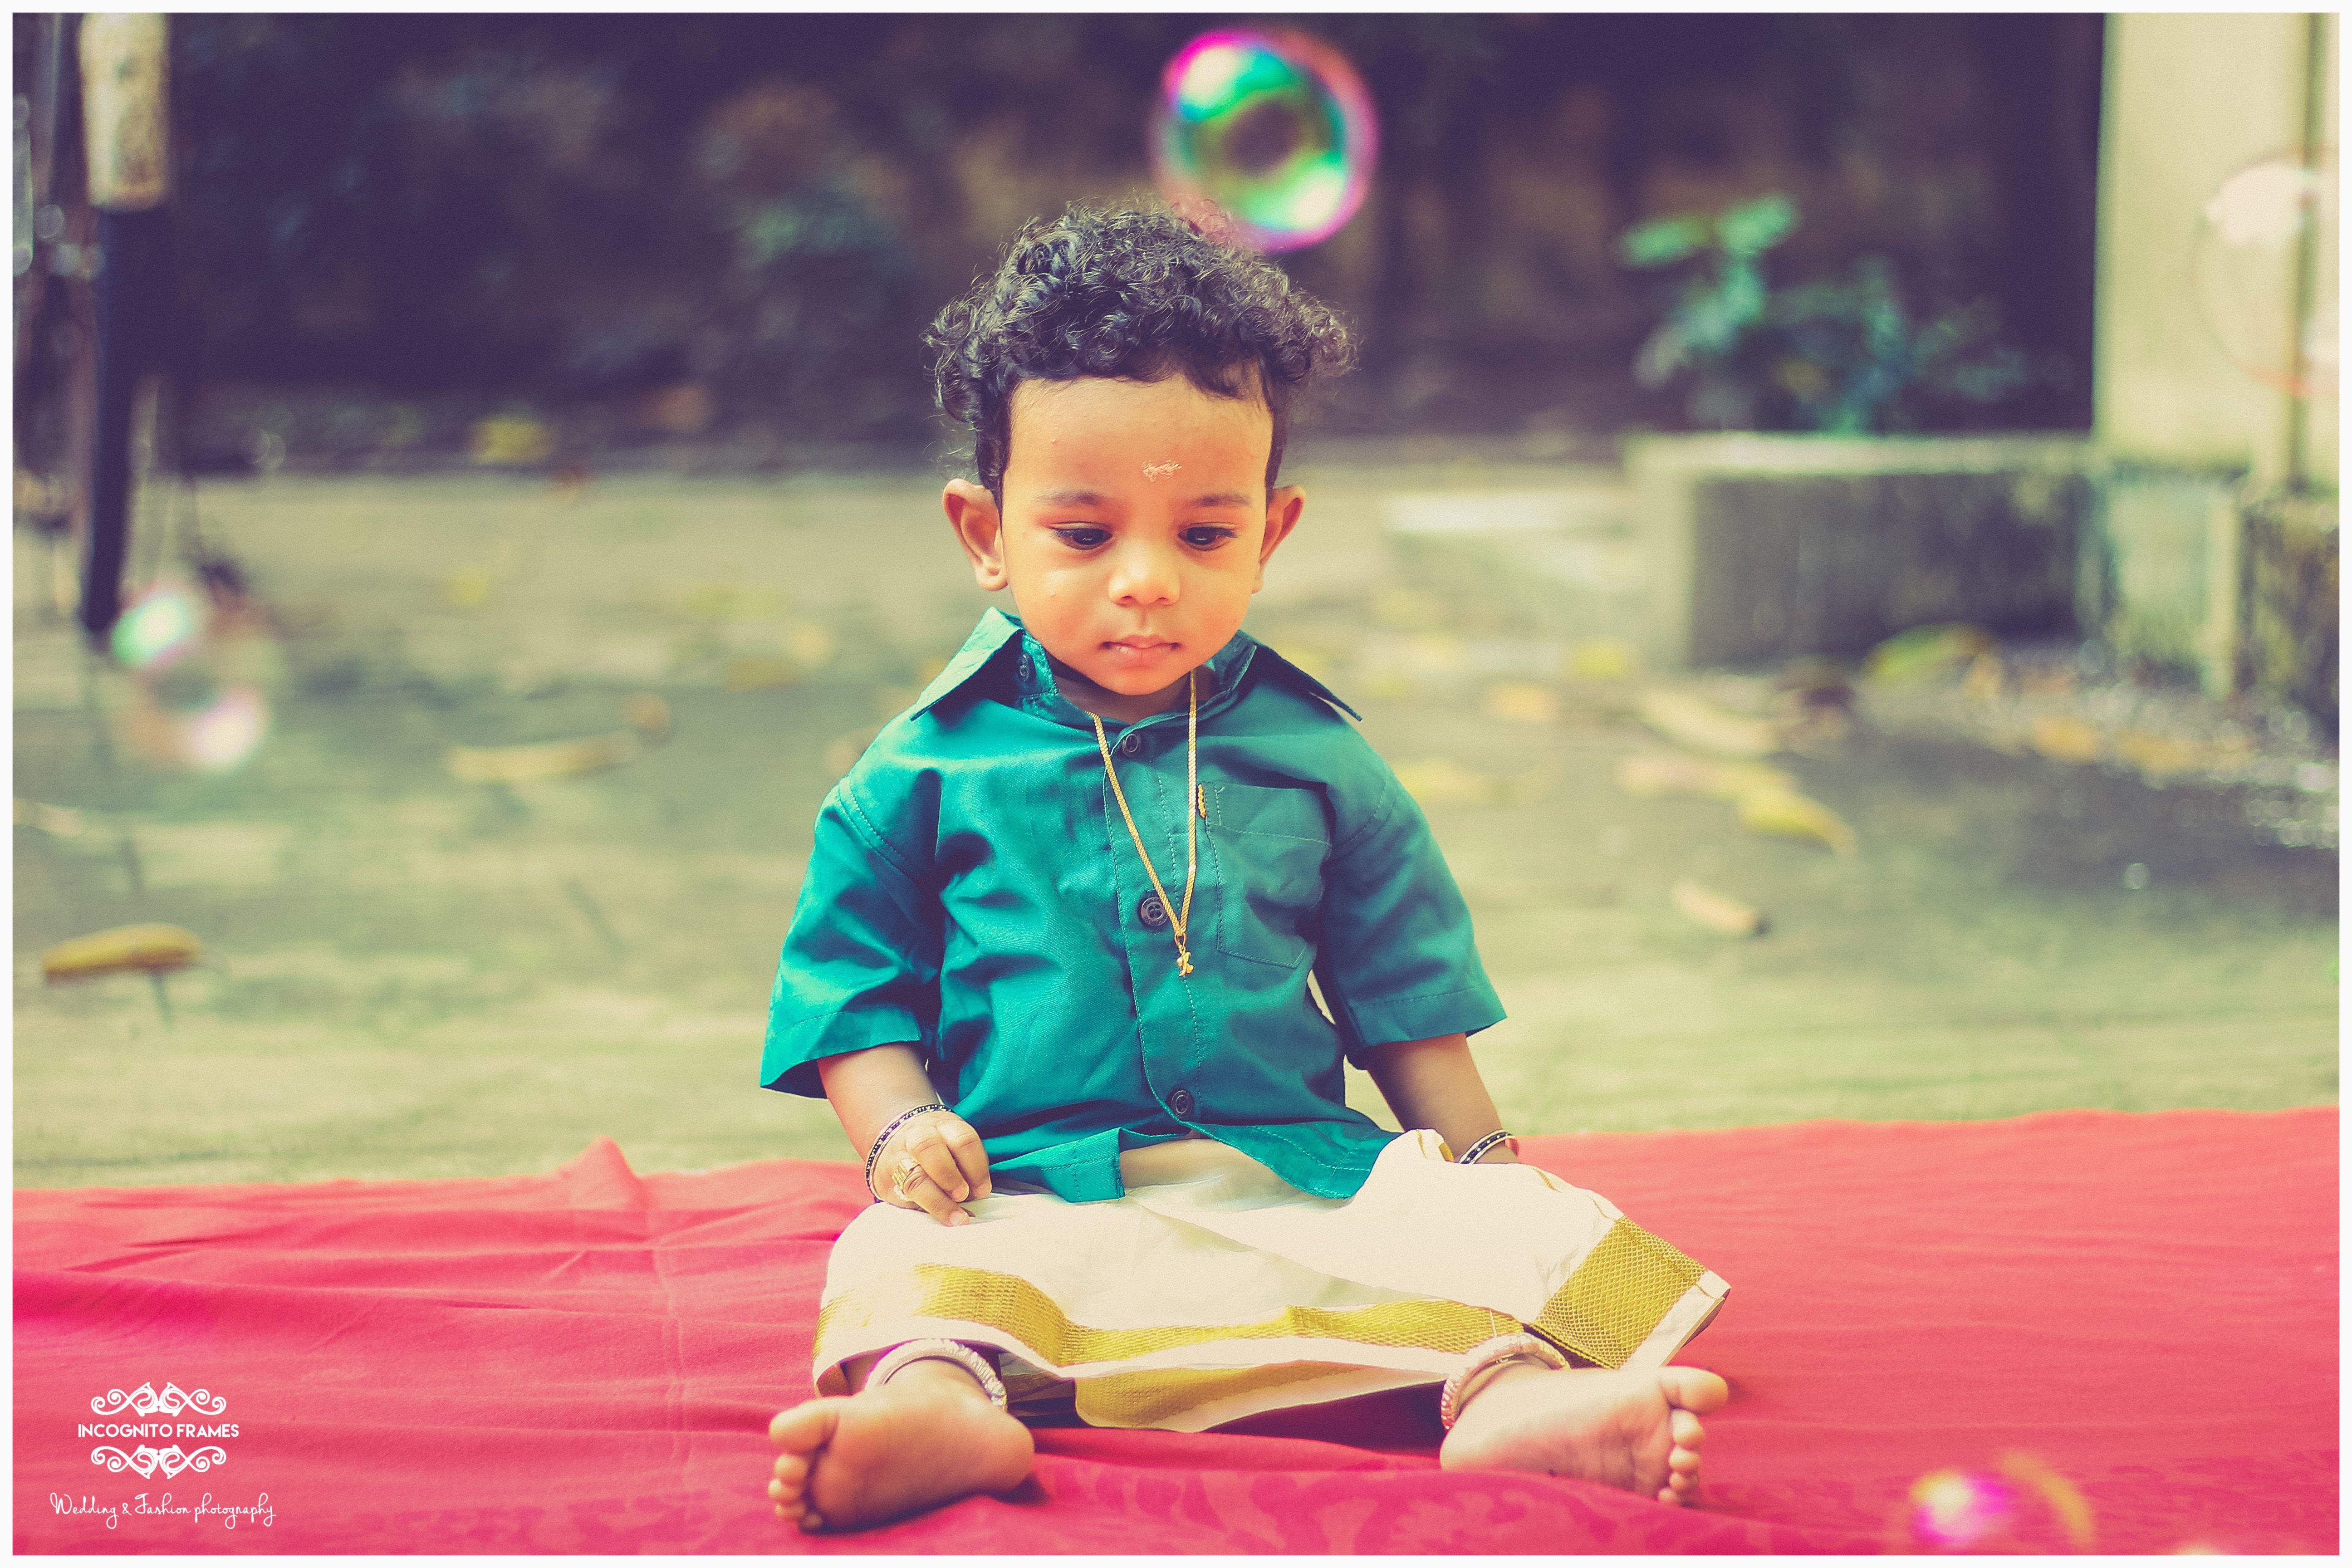 #KidsPhotography #Childrenphotography #Chennai #IncognitoFrames #Kidsportrait #Portrait